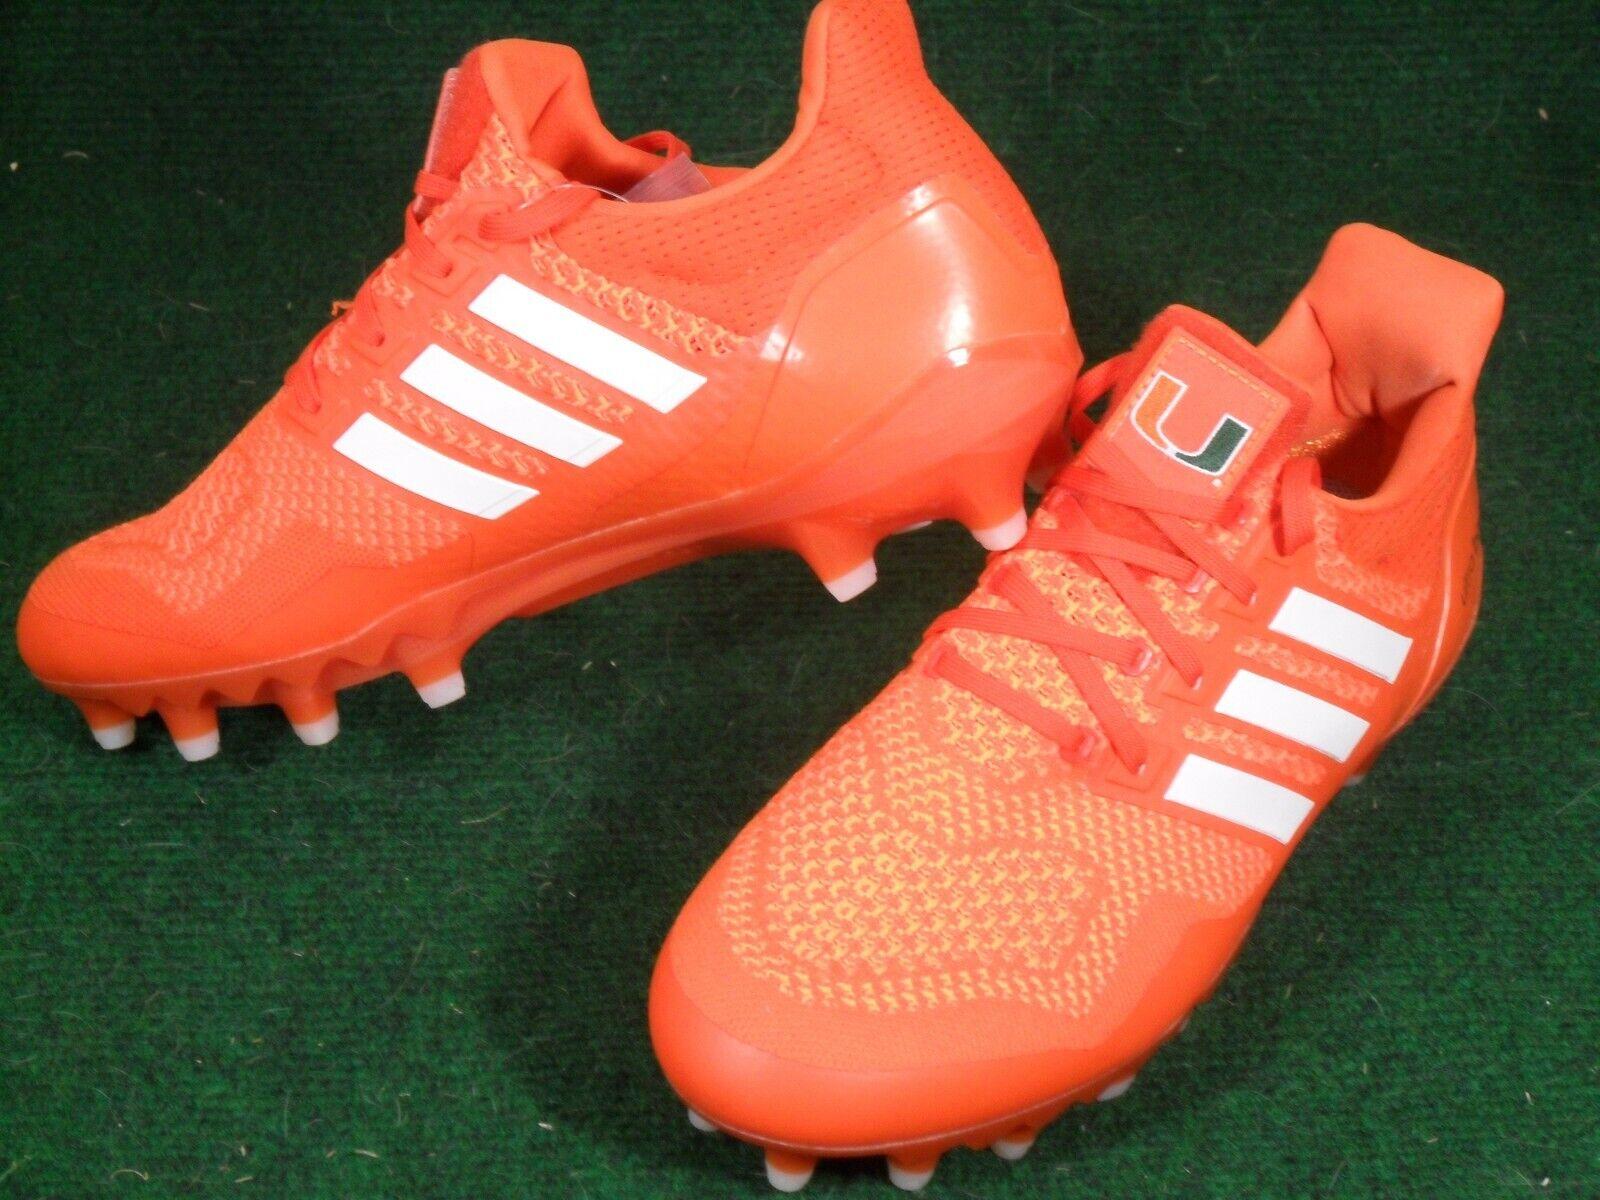 New Adidas Ultraboost Miami Hurricanes Team Issue PE Football Cleats Orange 10